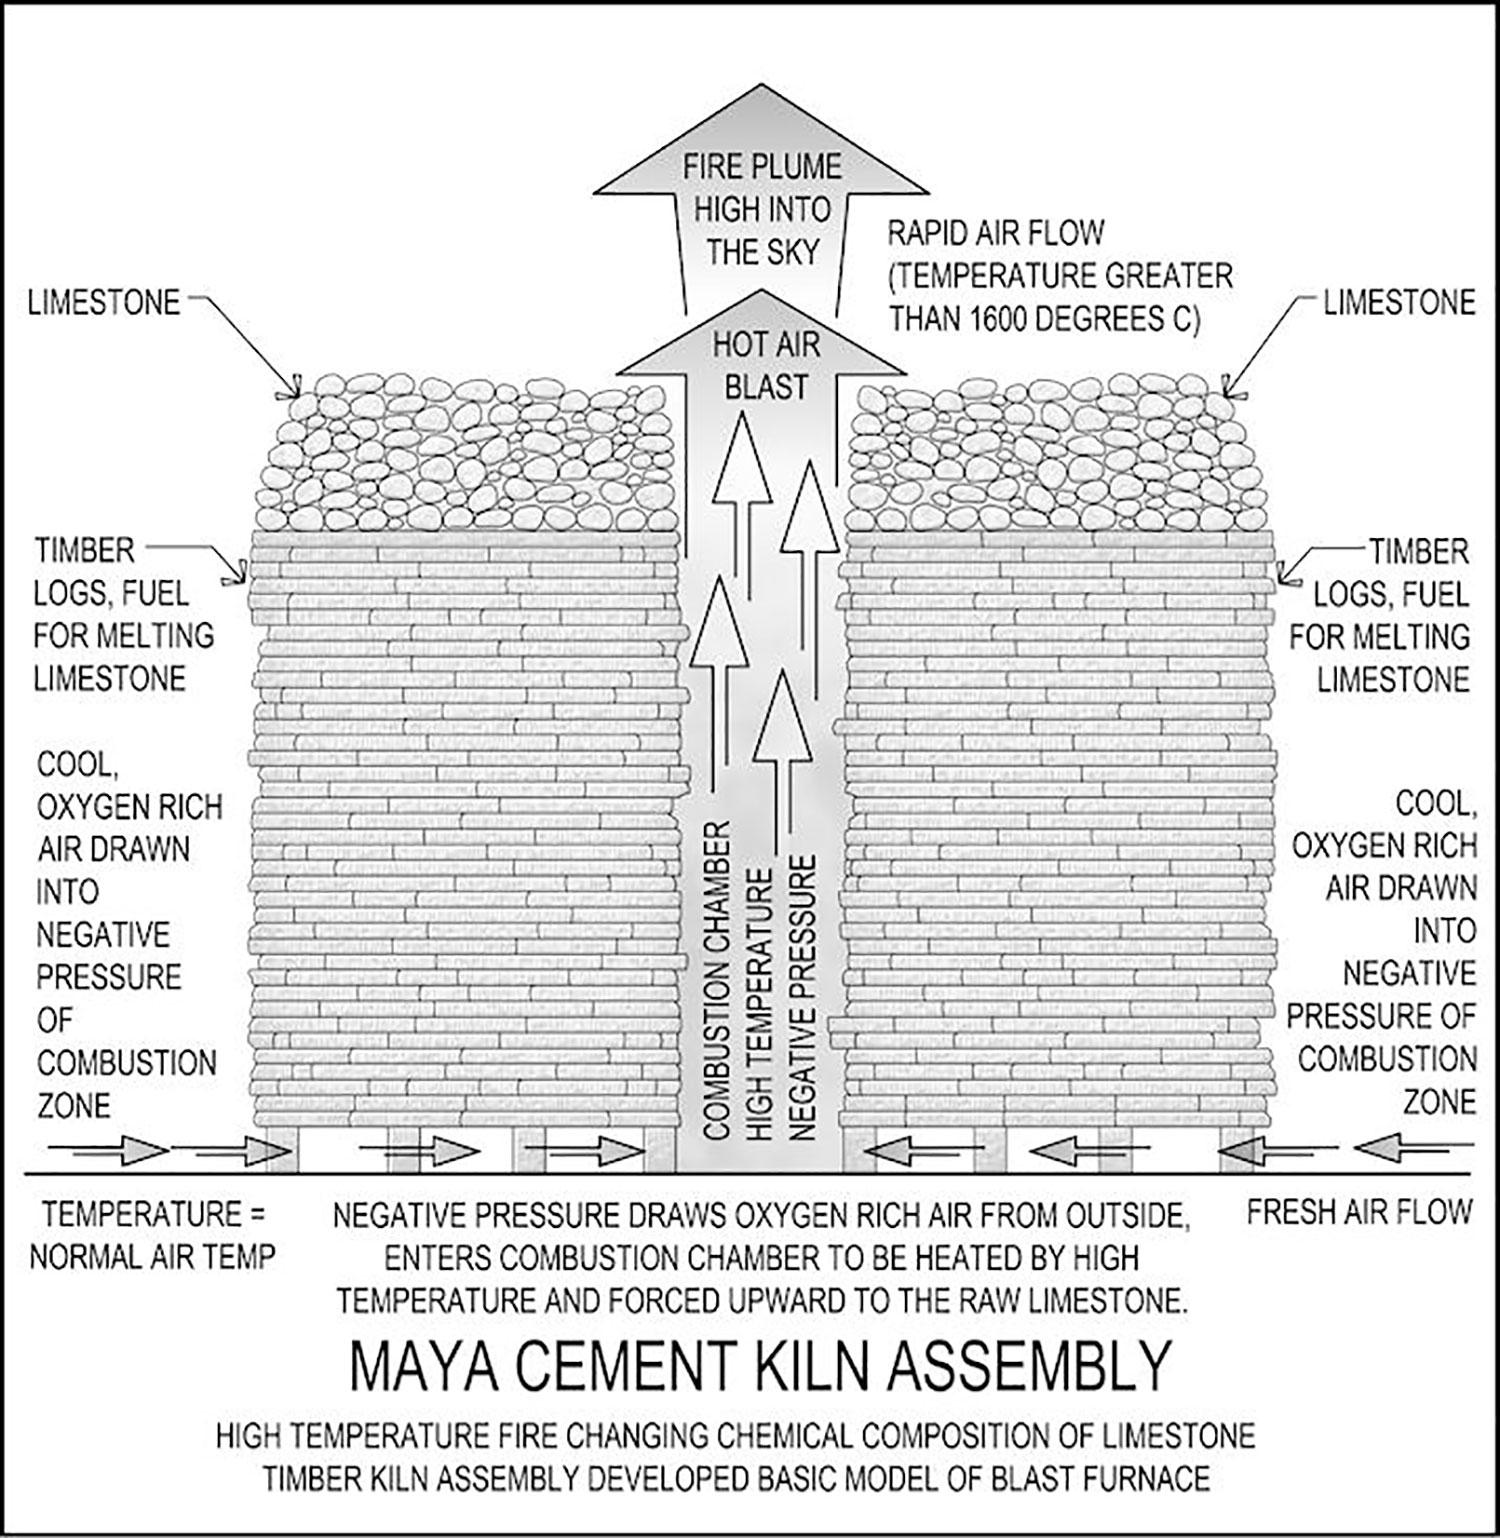 Maya kiln model by James O'Kon (The Lost Secrets of Maya Technology). Source:  theoldexplorer.com .